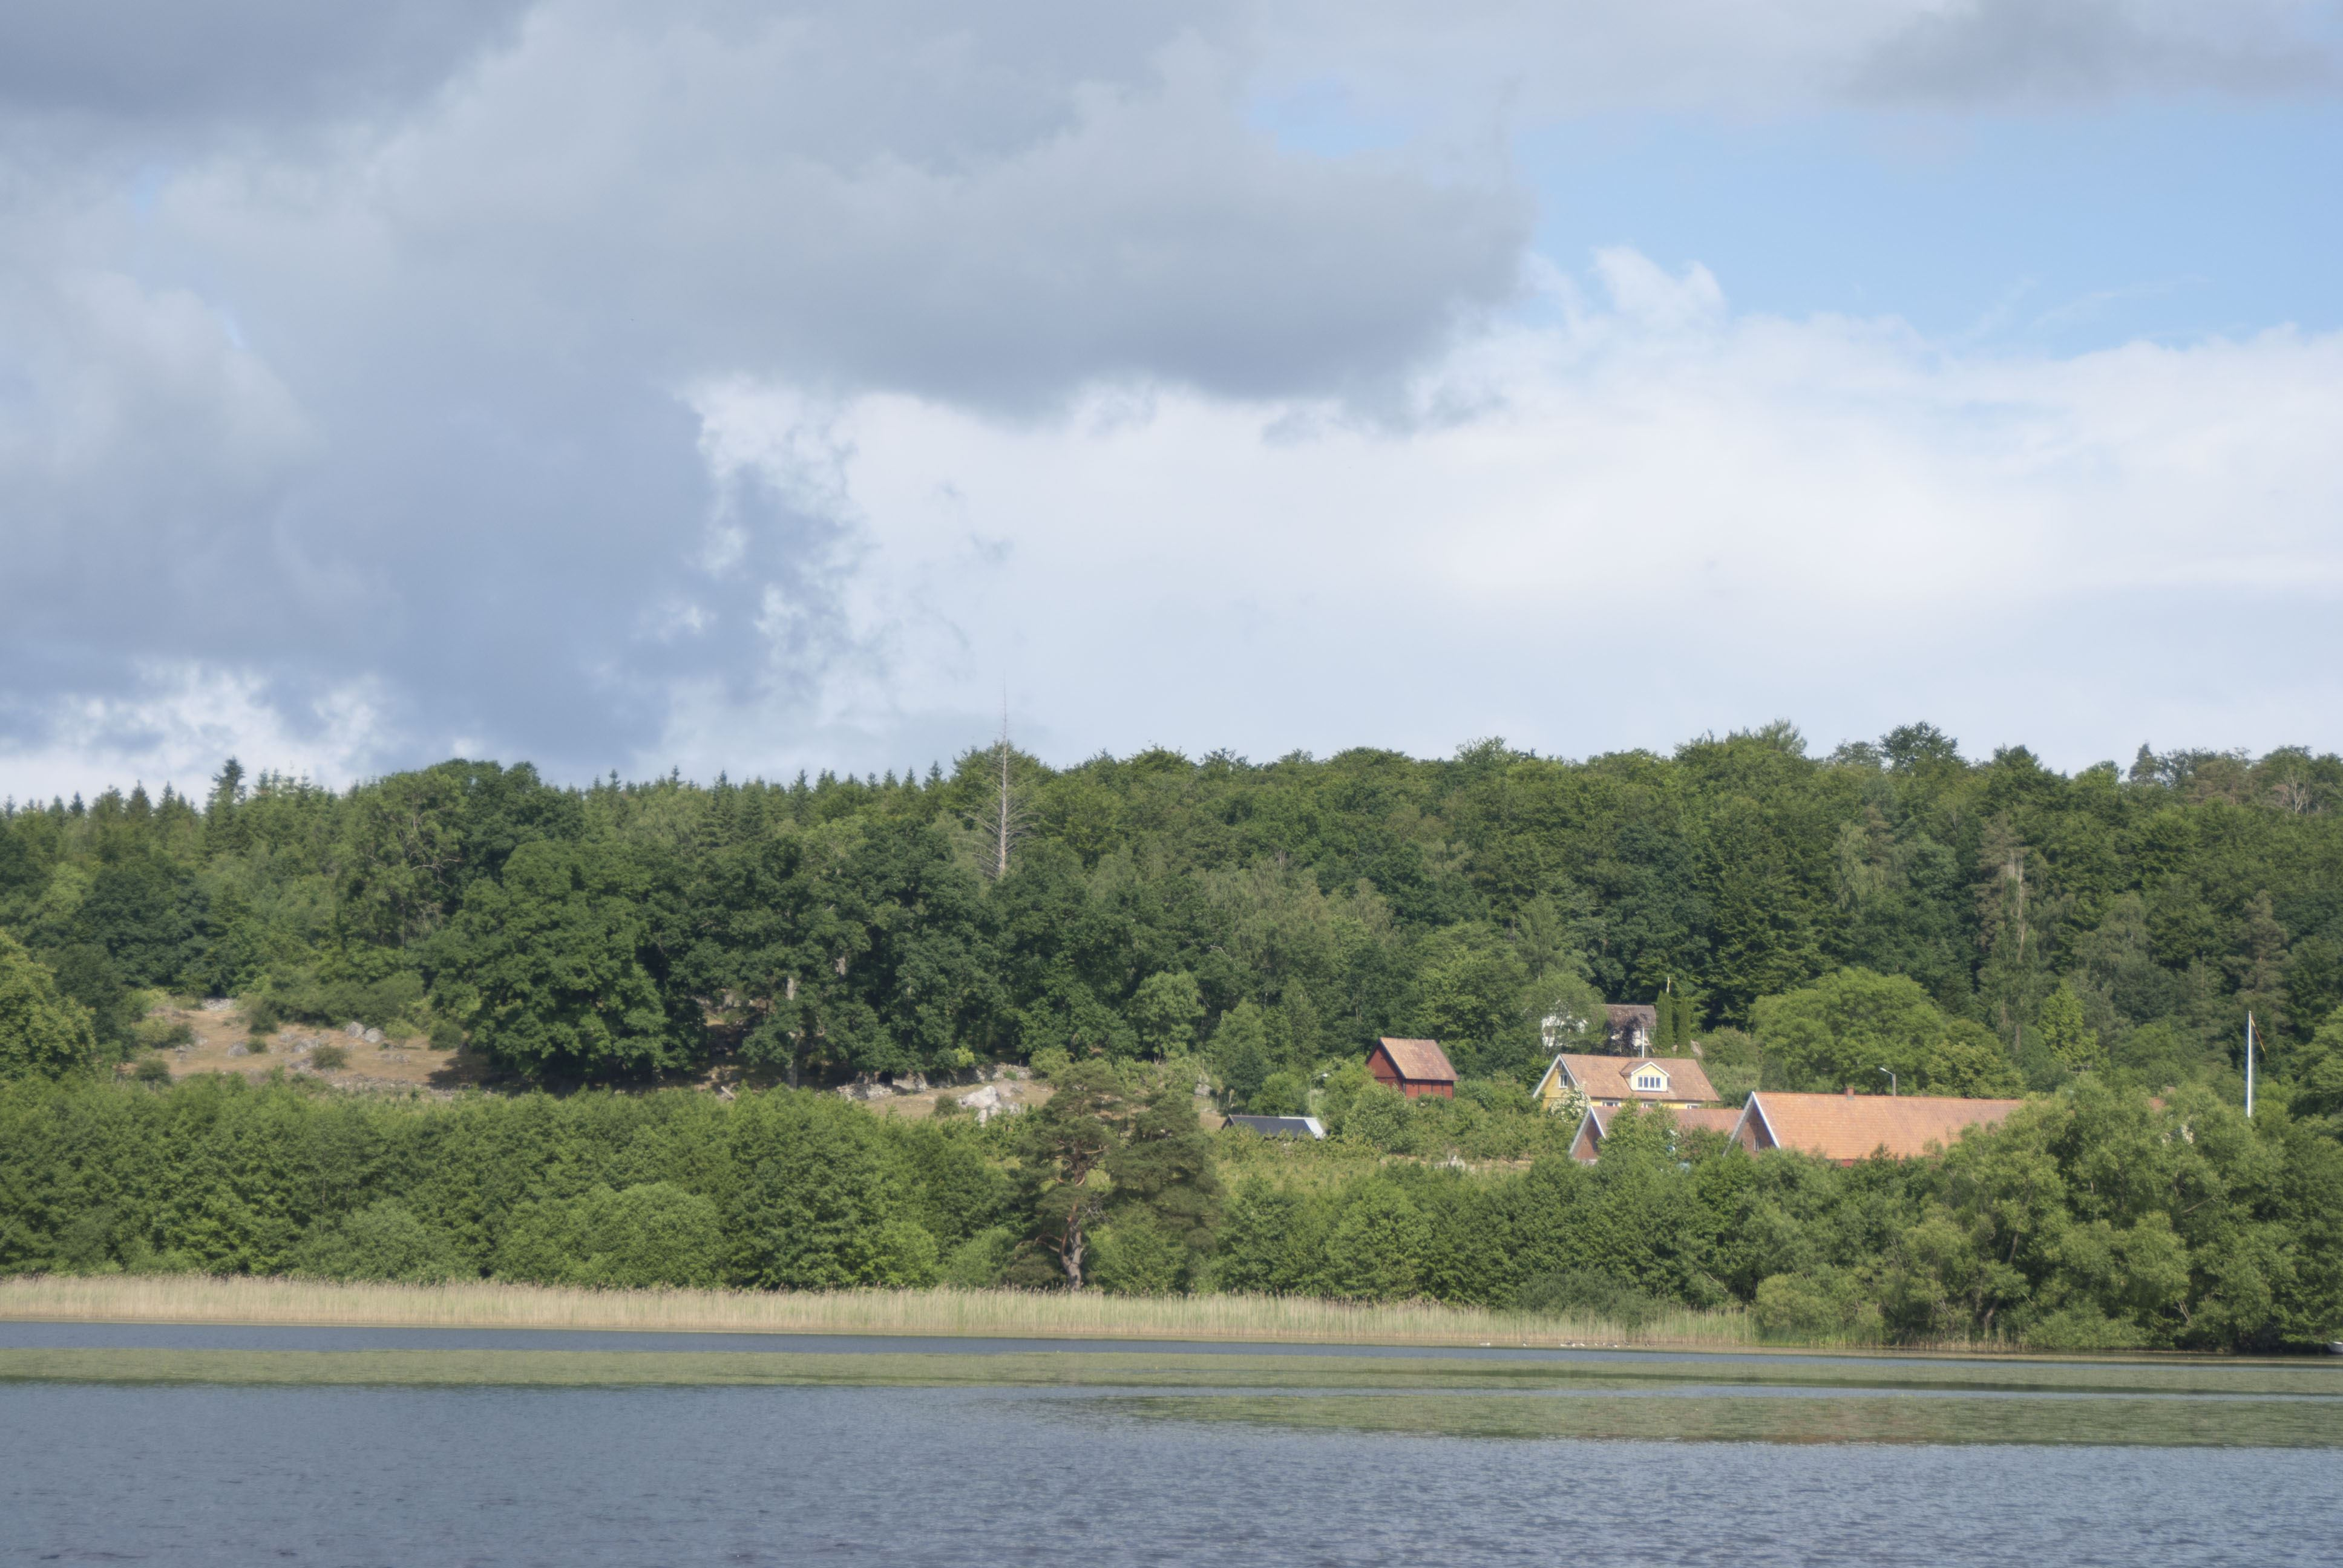 Tobias Delfin, Klackabackens badplats, Näsum